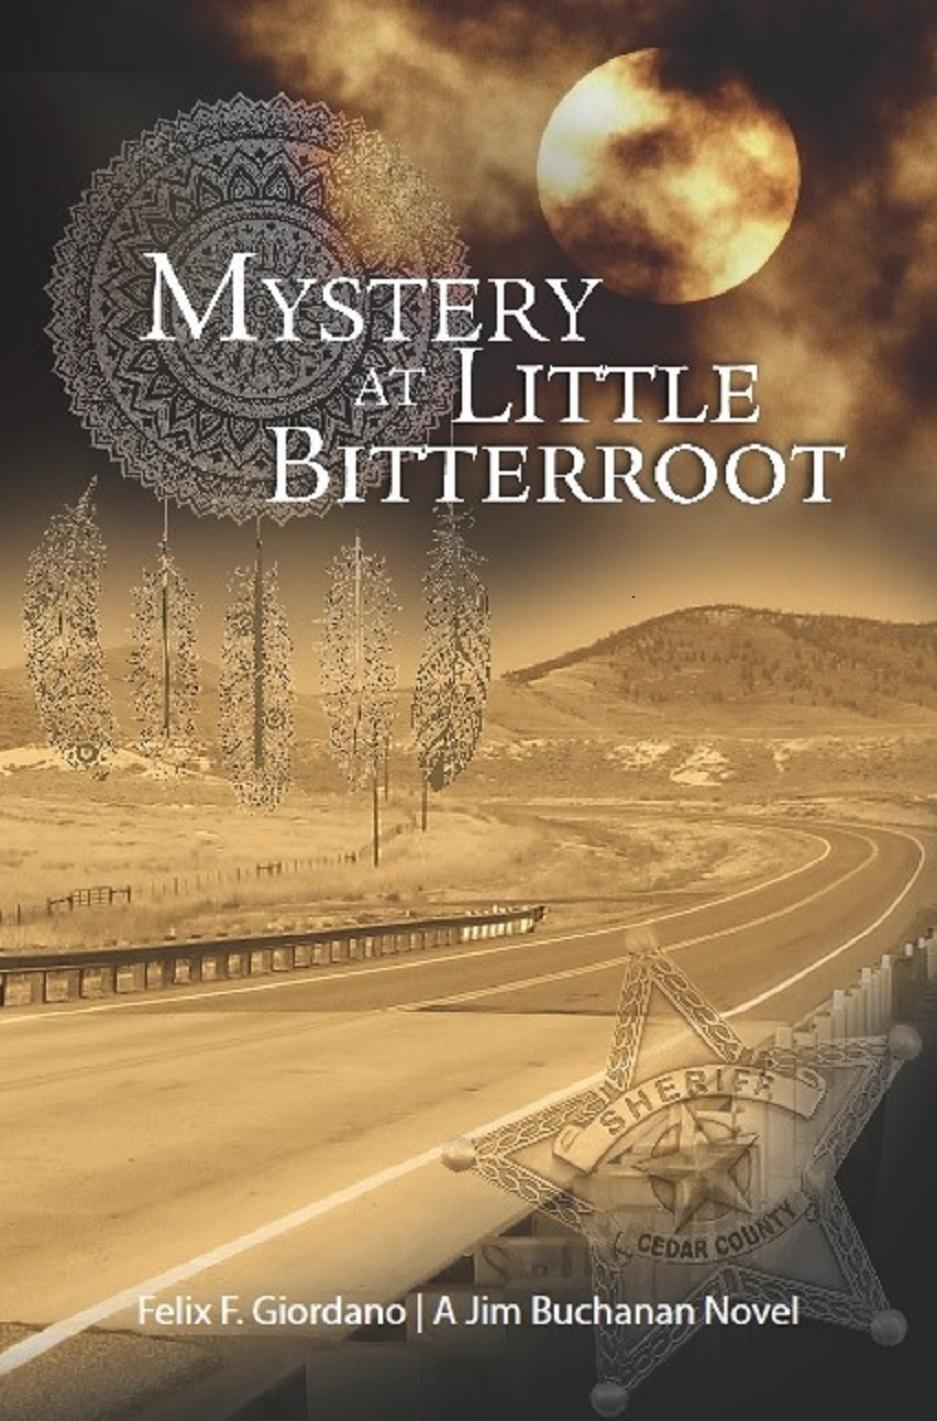 Mystery at Little Bitterroot Cover-2016.jpg